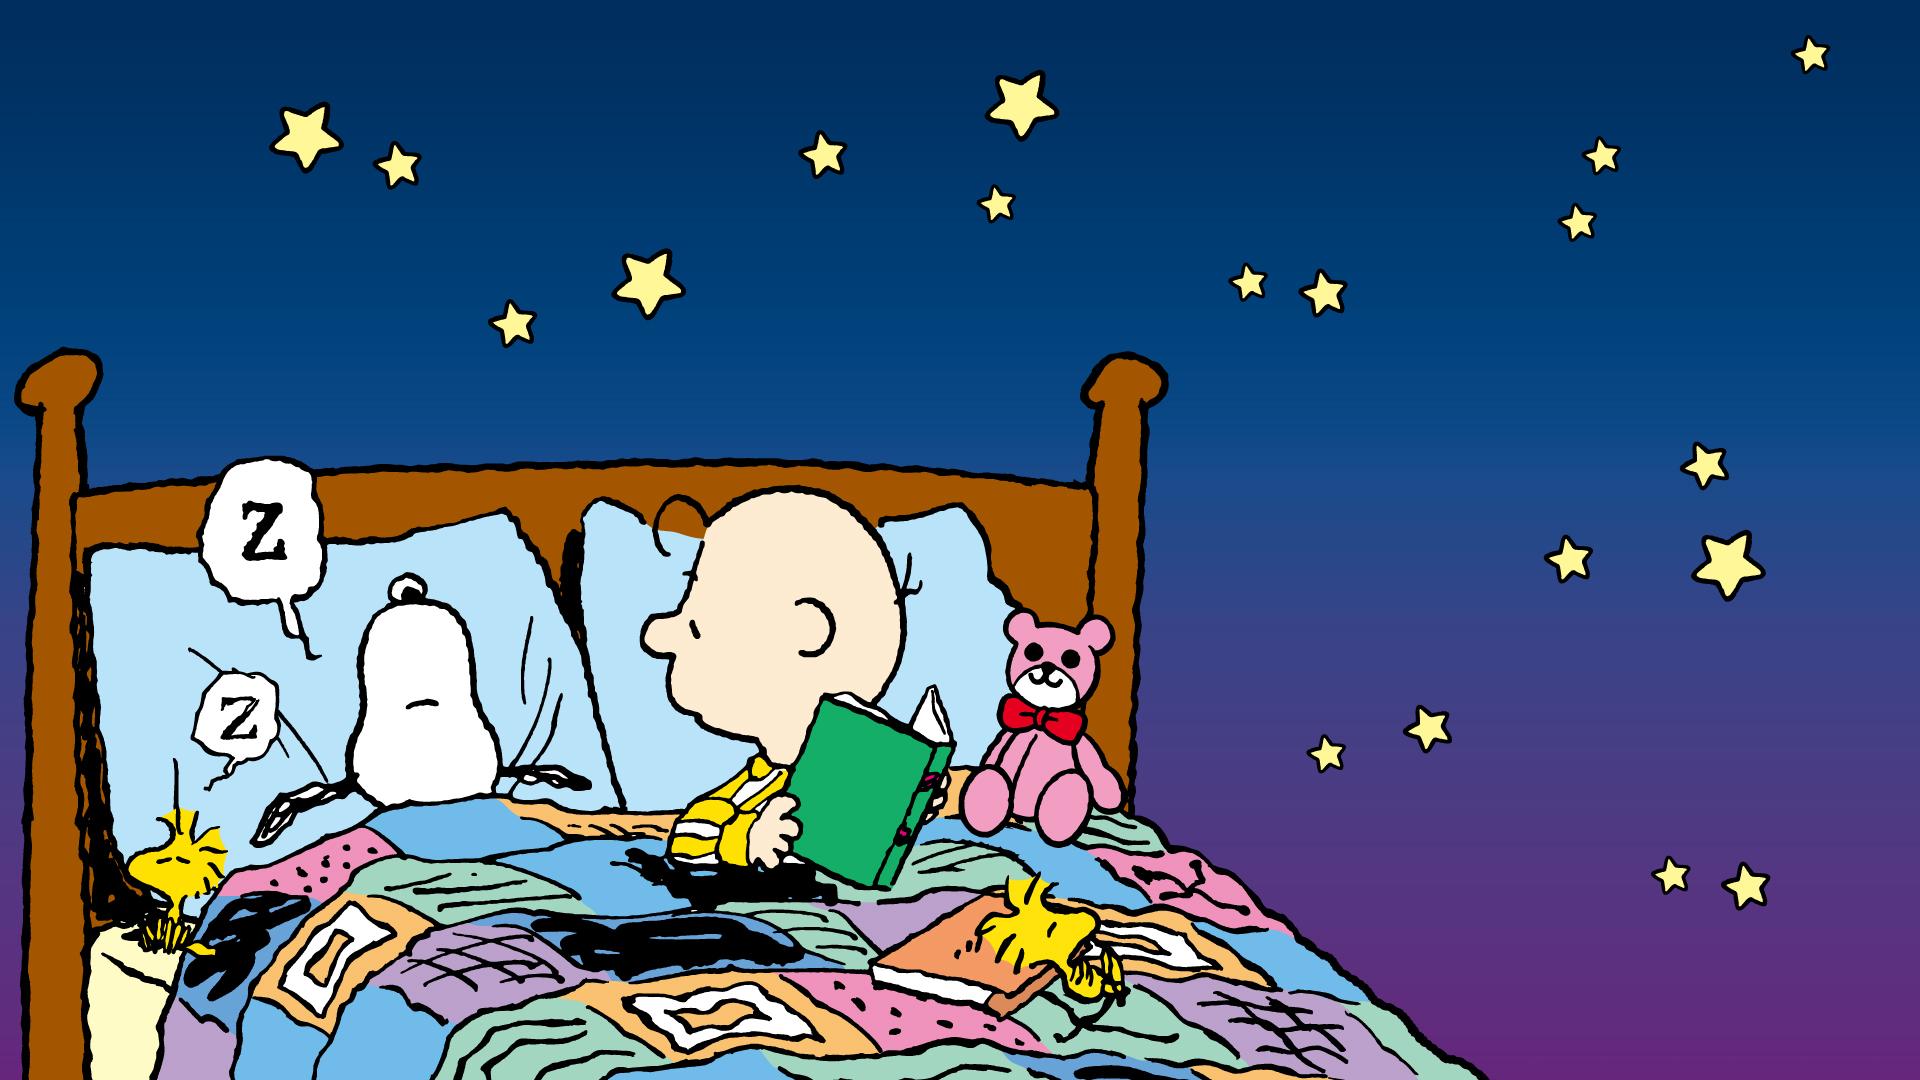 Snoopy Sleeping Wallpaper - Snoopy Sleeping Wallpaper